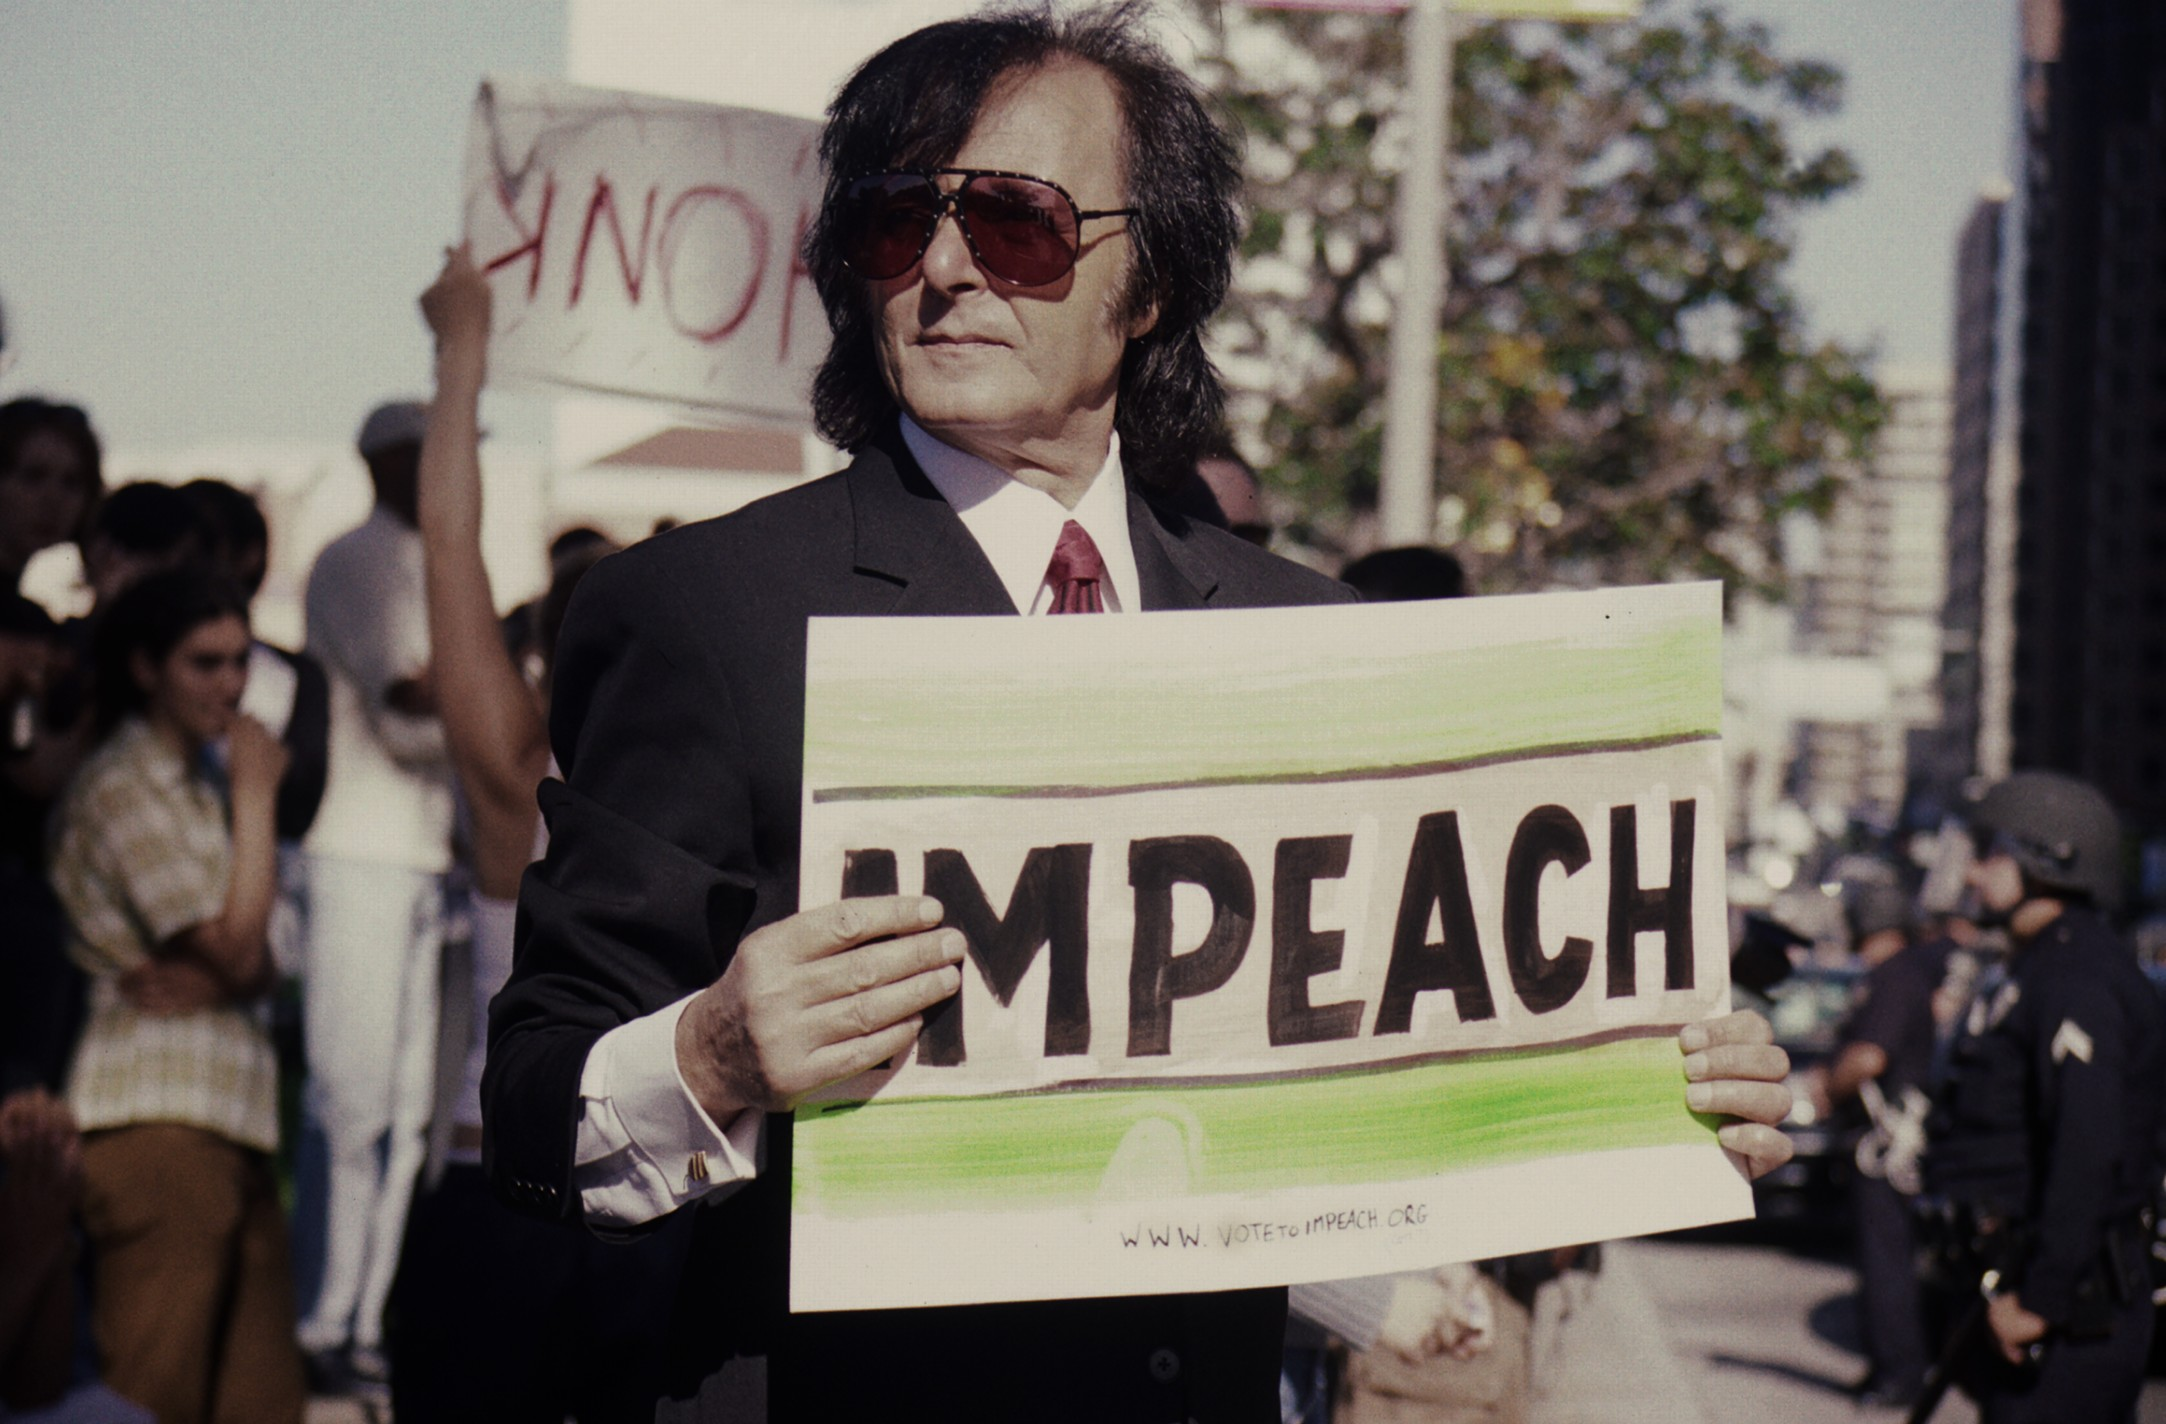 Andrea Geyer, Impeach, 2003/2020